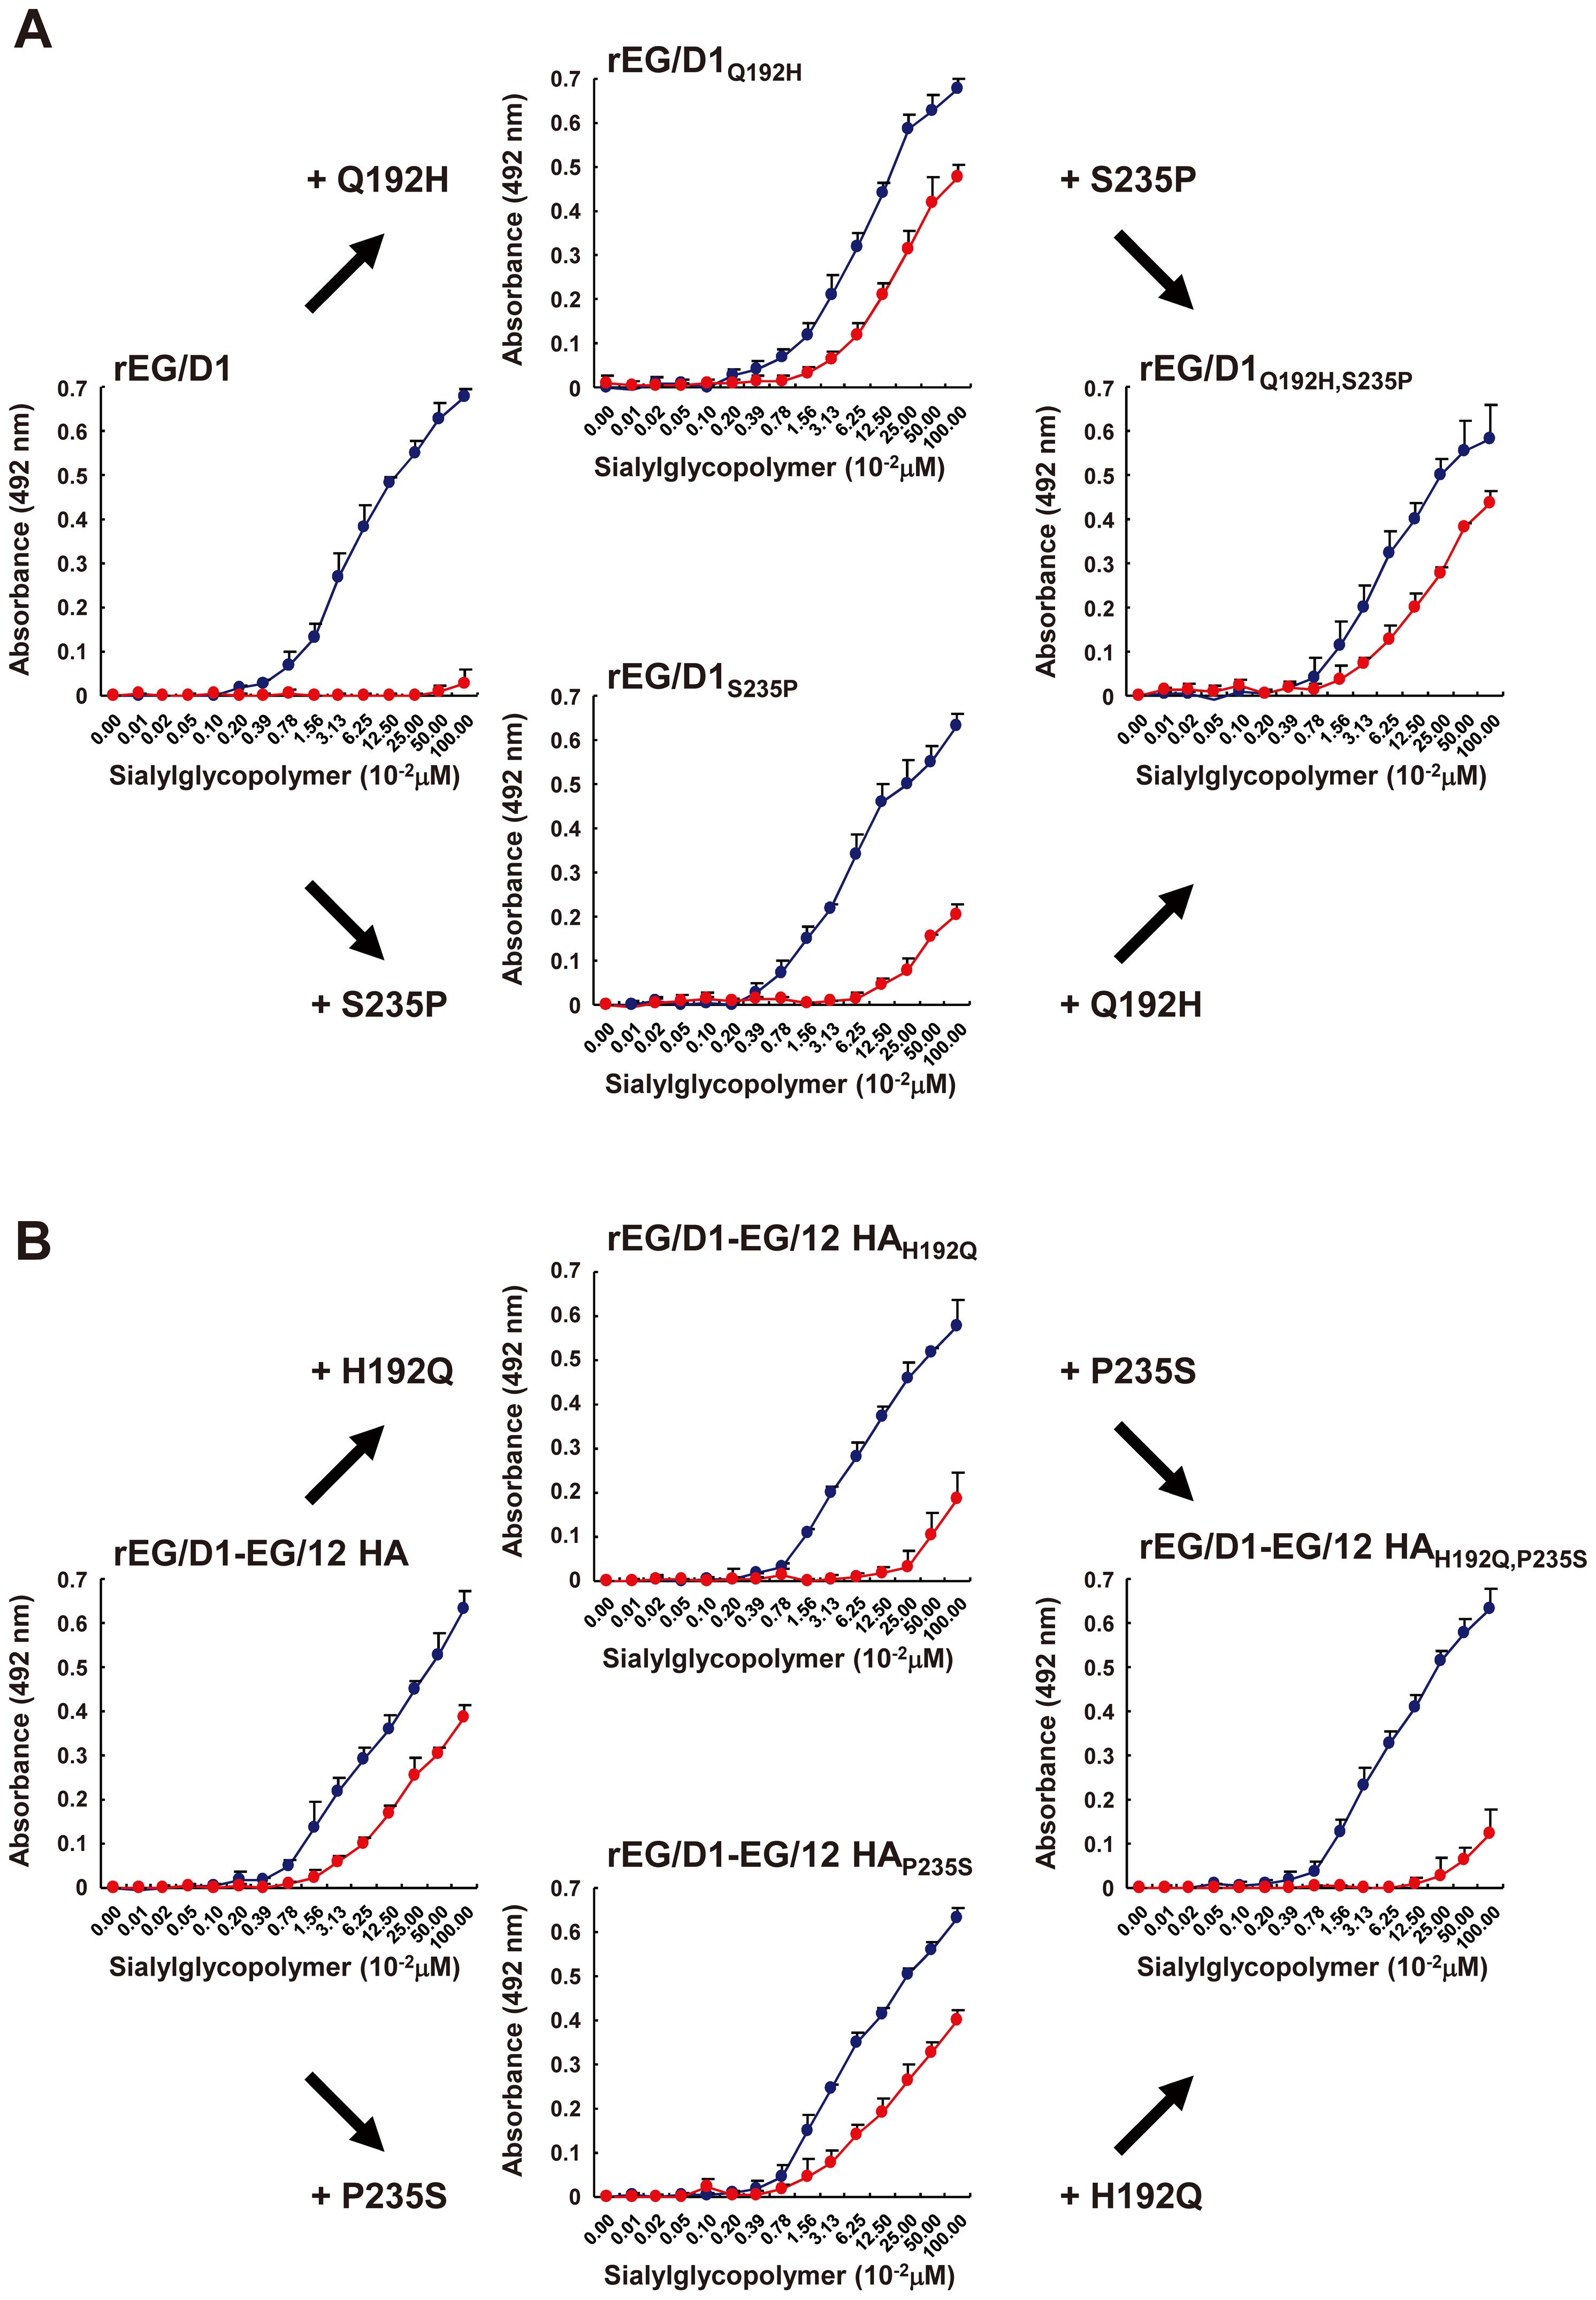 Effect of HA mutations in sublineage A viruses on receptor specificity of EG/D1 virus HA.